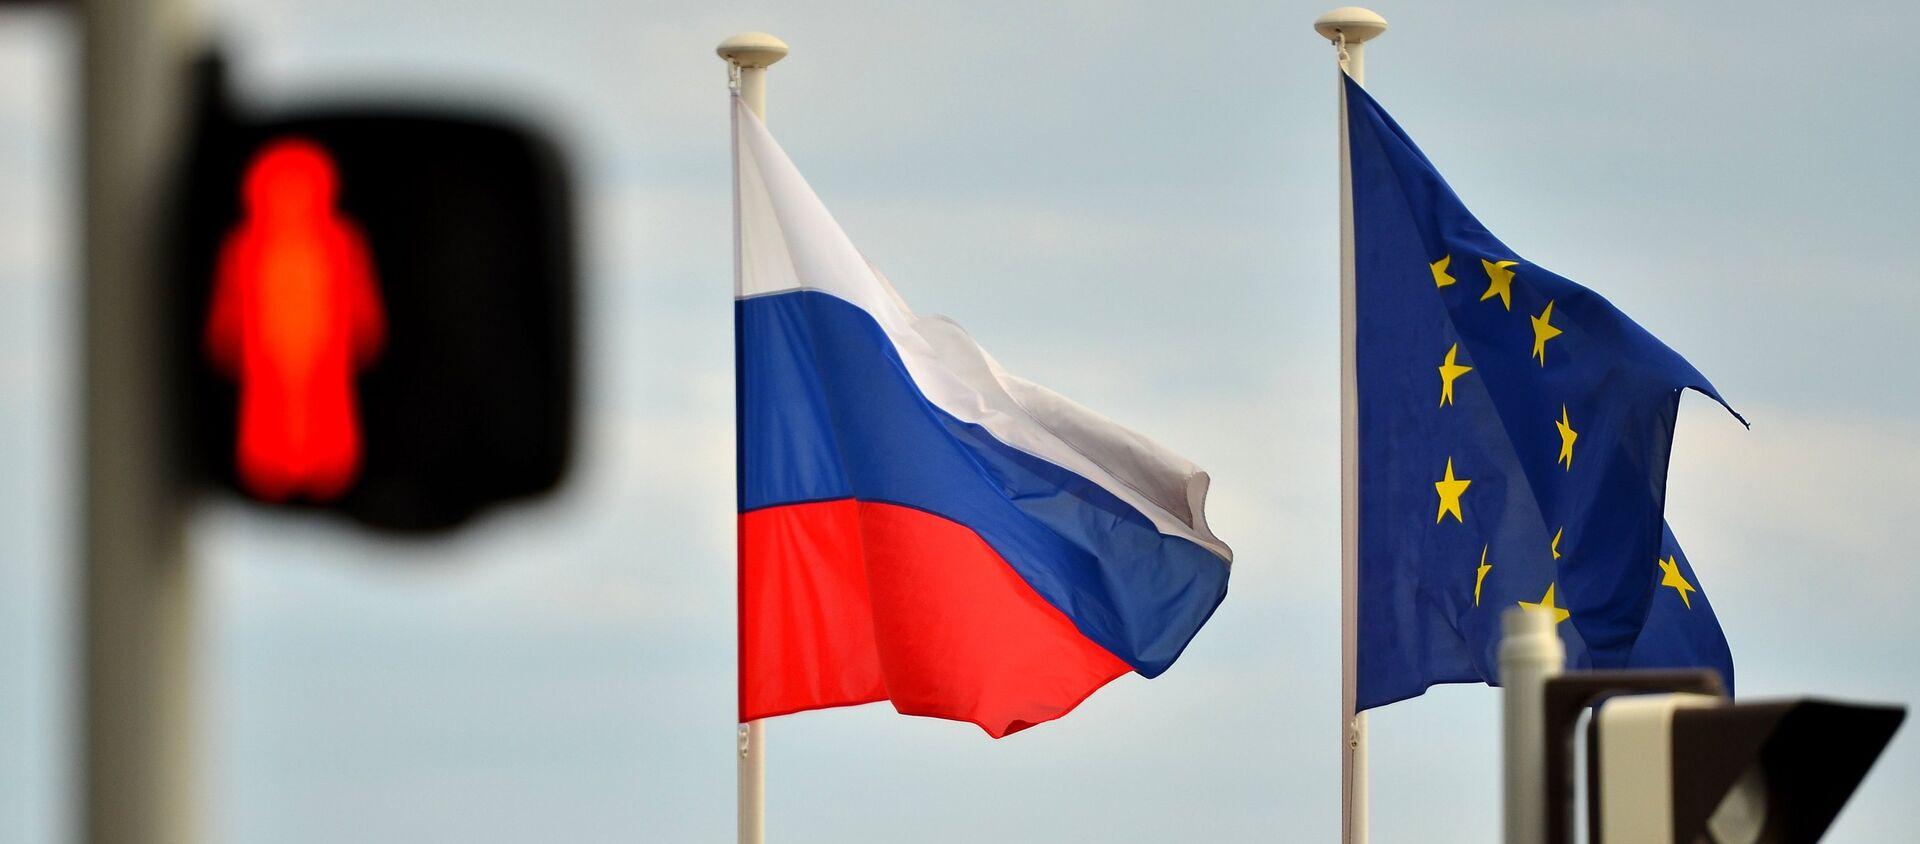 Флаги России и ЕС - Sputnik Беларусь, 1920, 08.02.2021